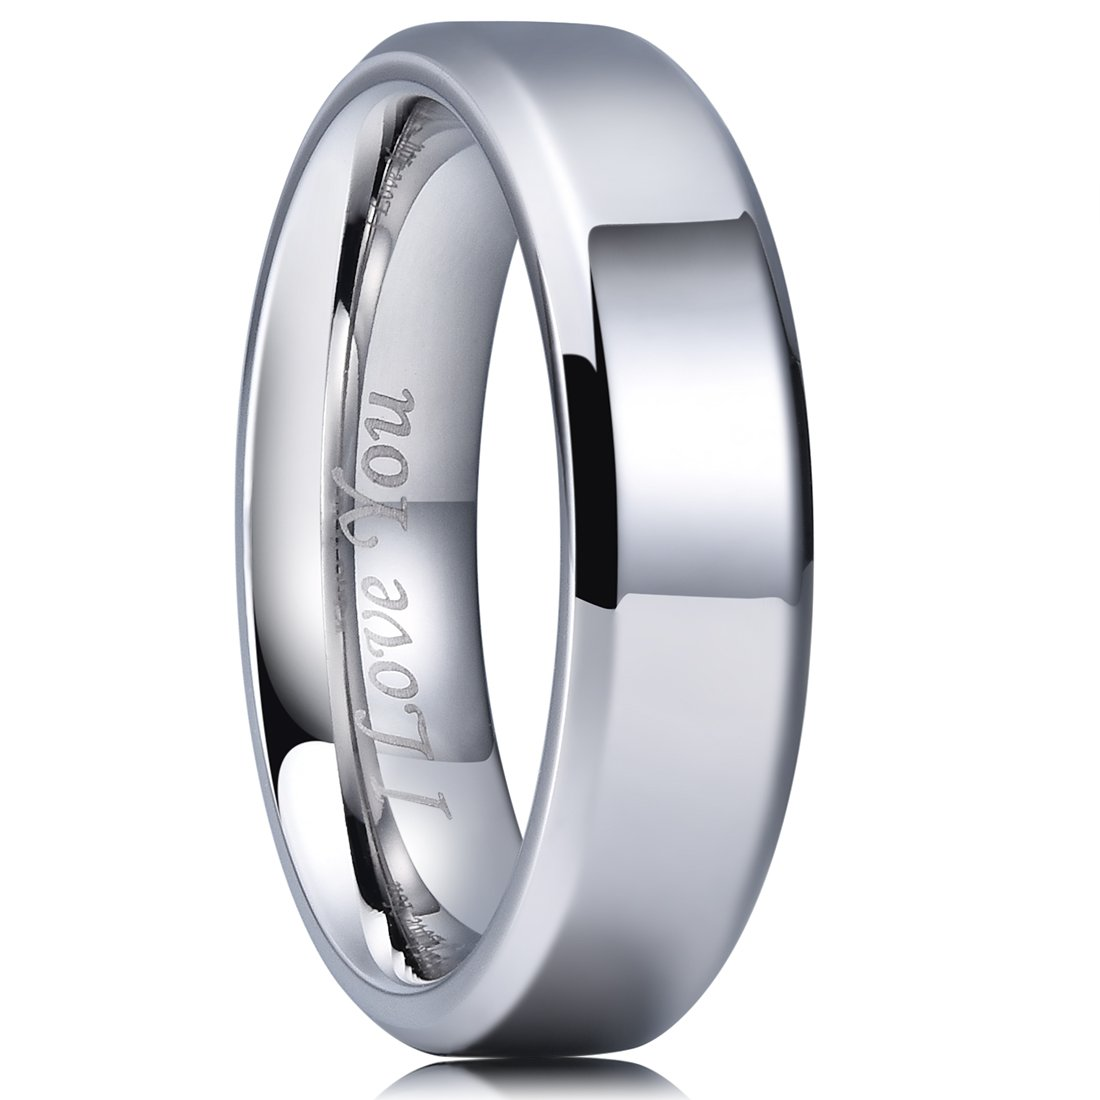 King Will BASIC 6mm Stainless Steel Ring Polished Plain Beveled Edge Wedding Band Laser Etched I Love You 10